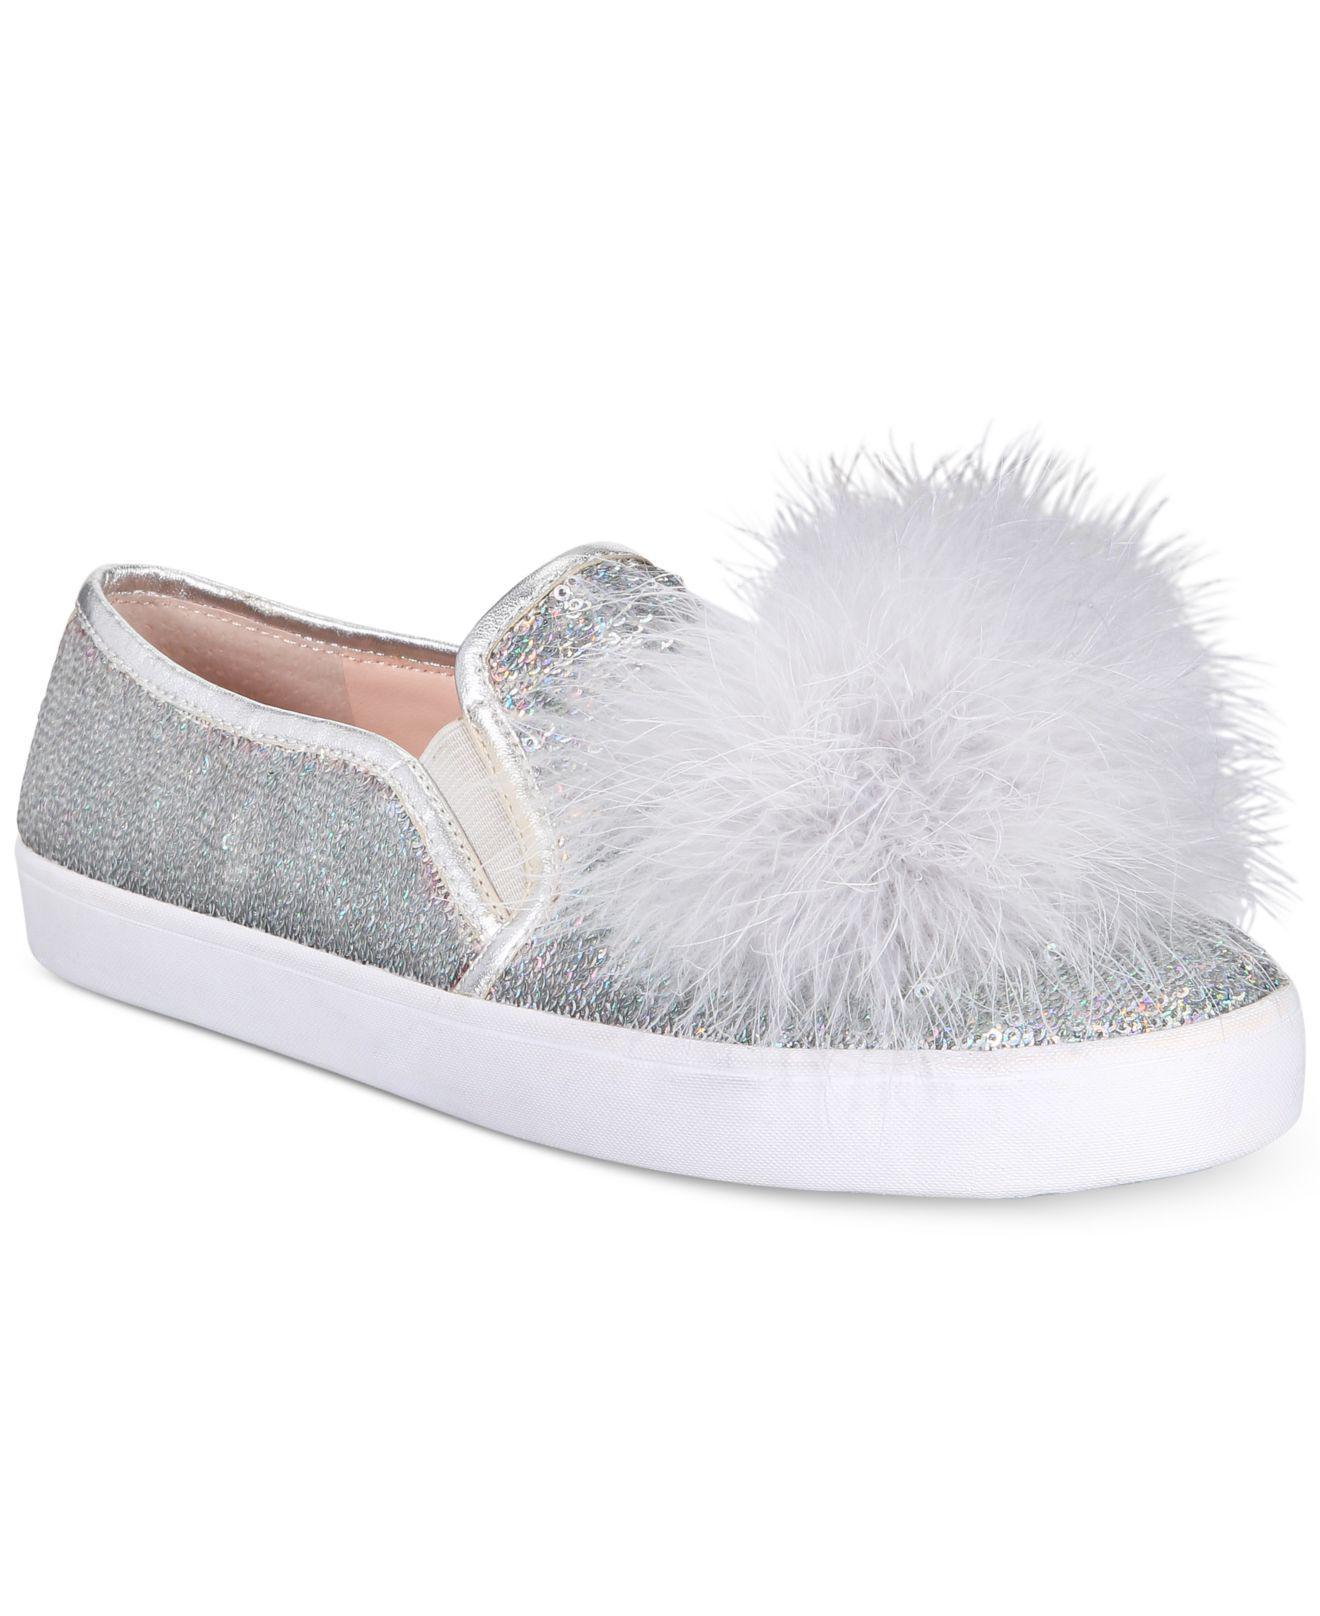 69e61297695b Lyst - Kate Spade Latisa Slip-on Sneakers